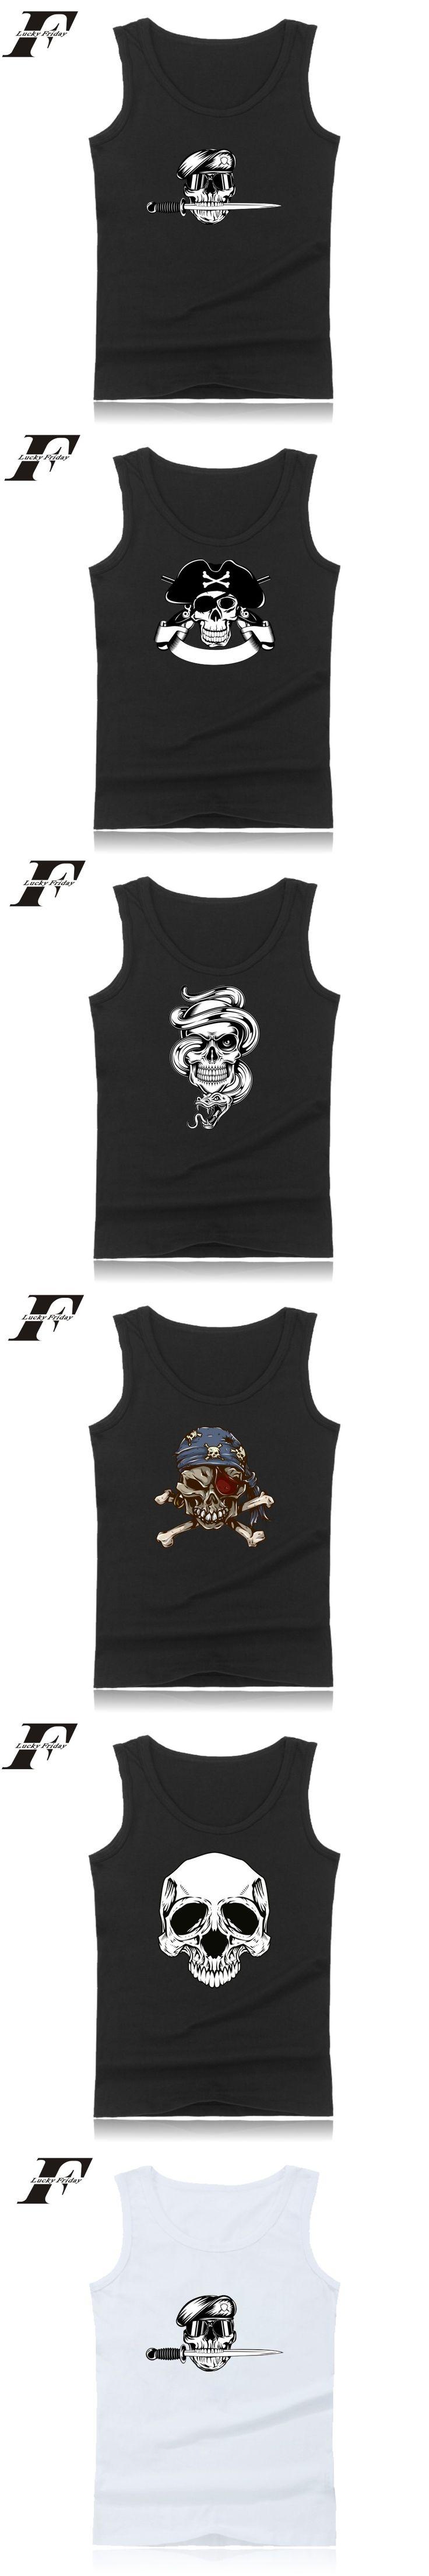 shirt Skeleton fitness Bodybuilding Tank Top Skull Print Fitness  clothing Workout Tank Top men Summer Vest 4xl